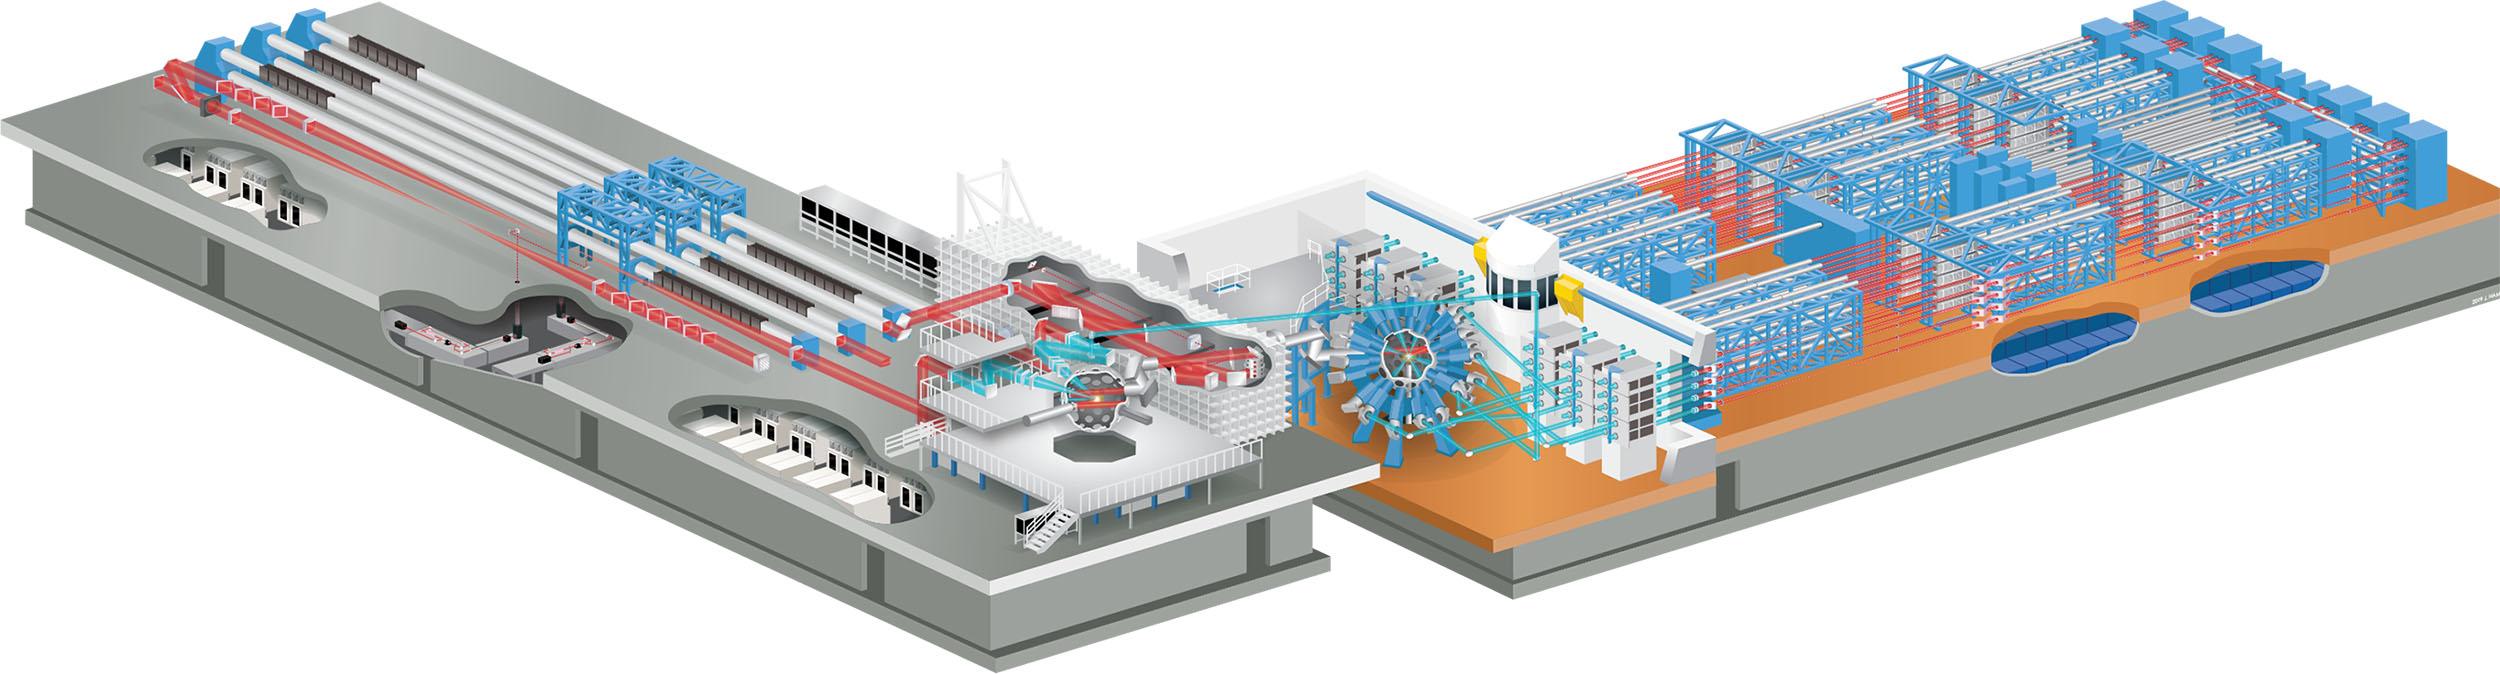 Omega Laser Facility illustration